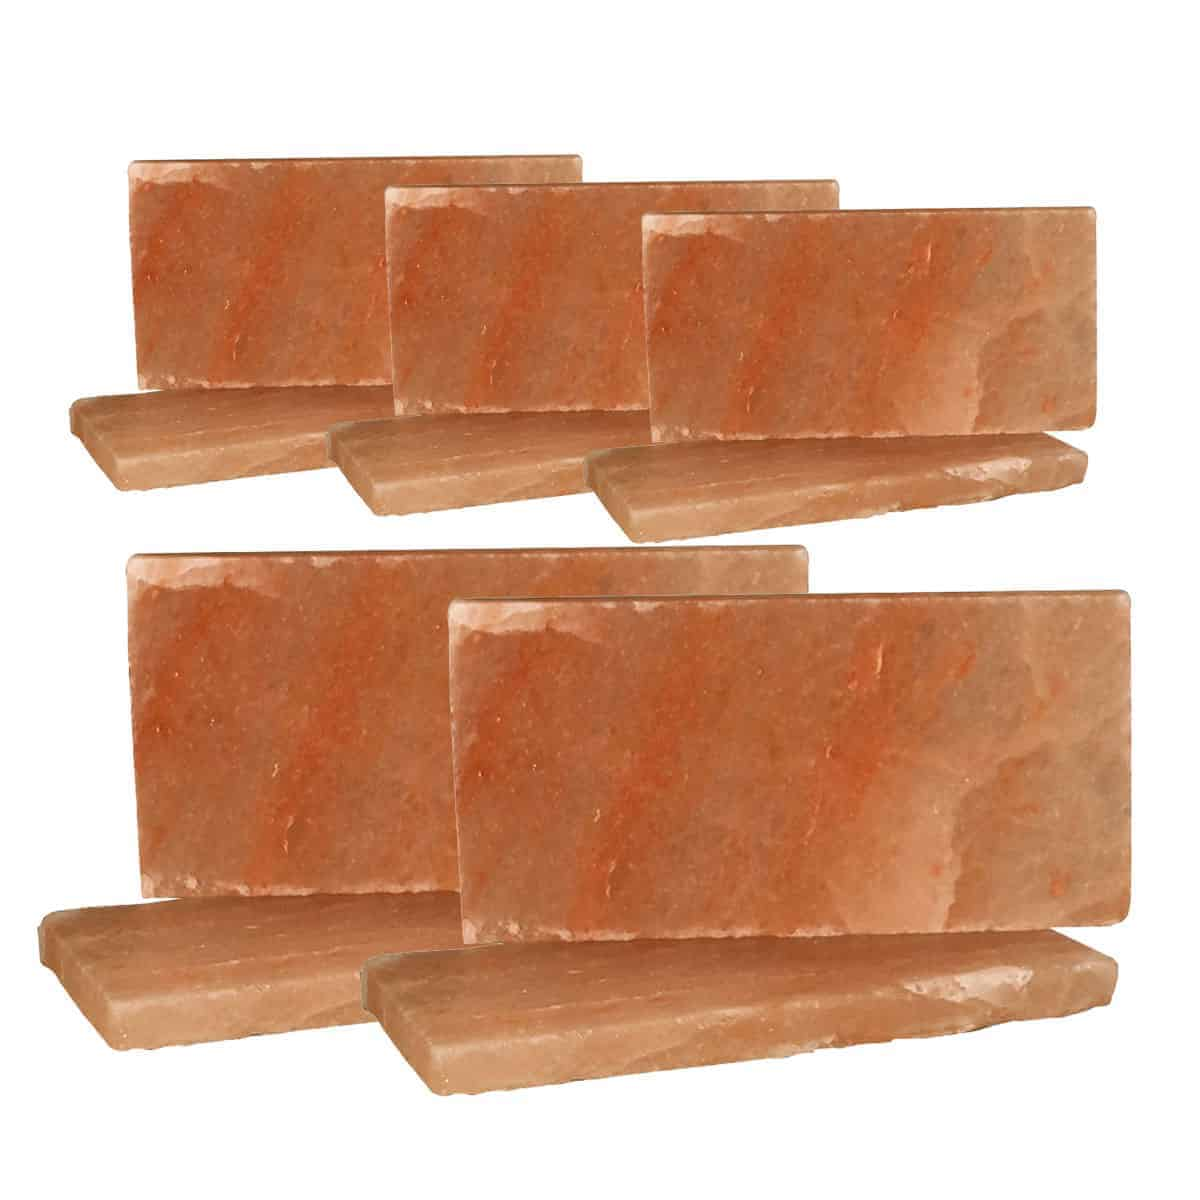 6x12x1 Salt Bricks Quantity 10